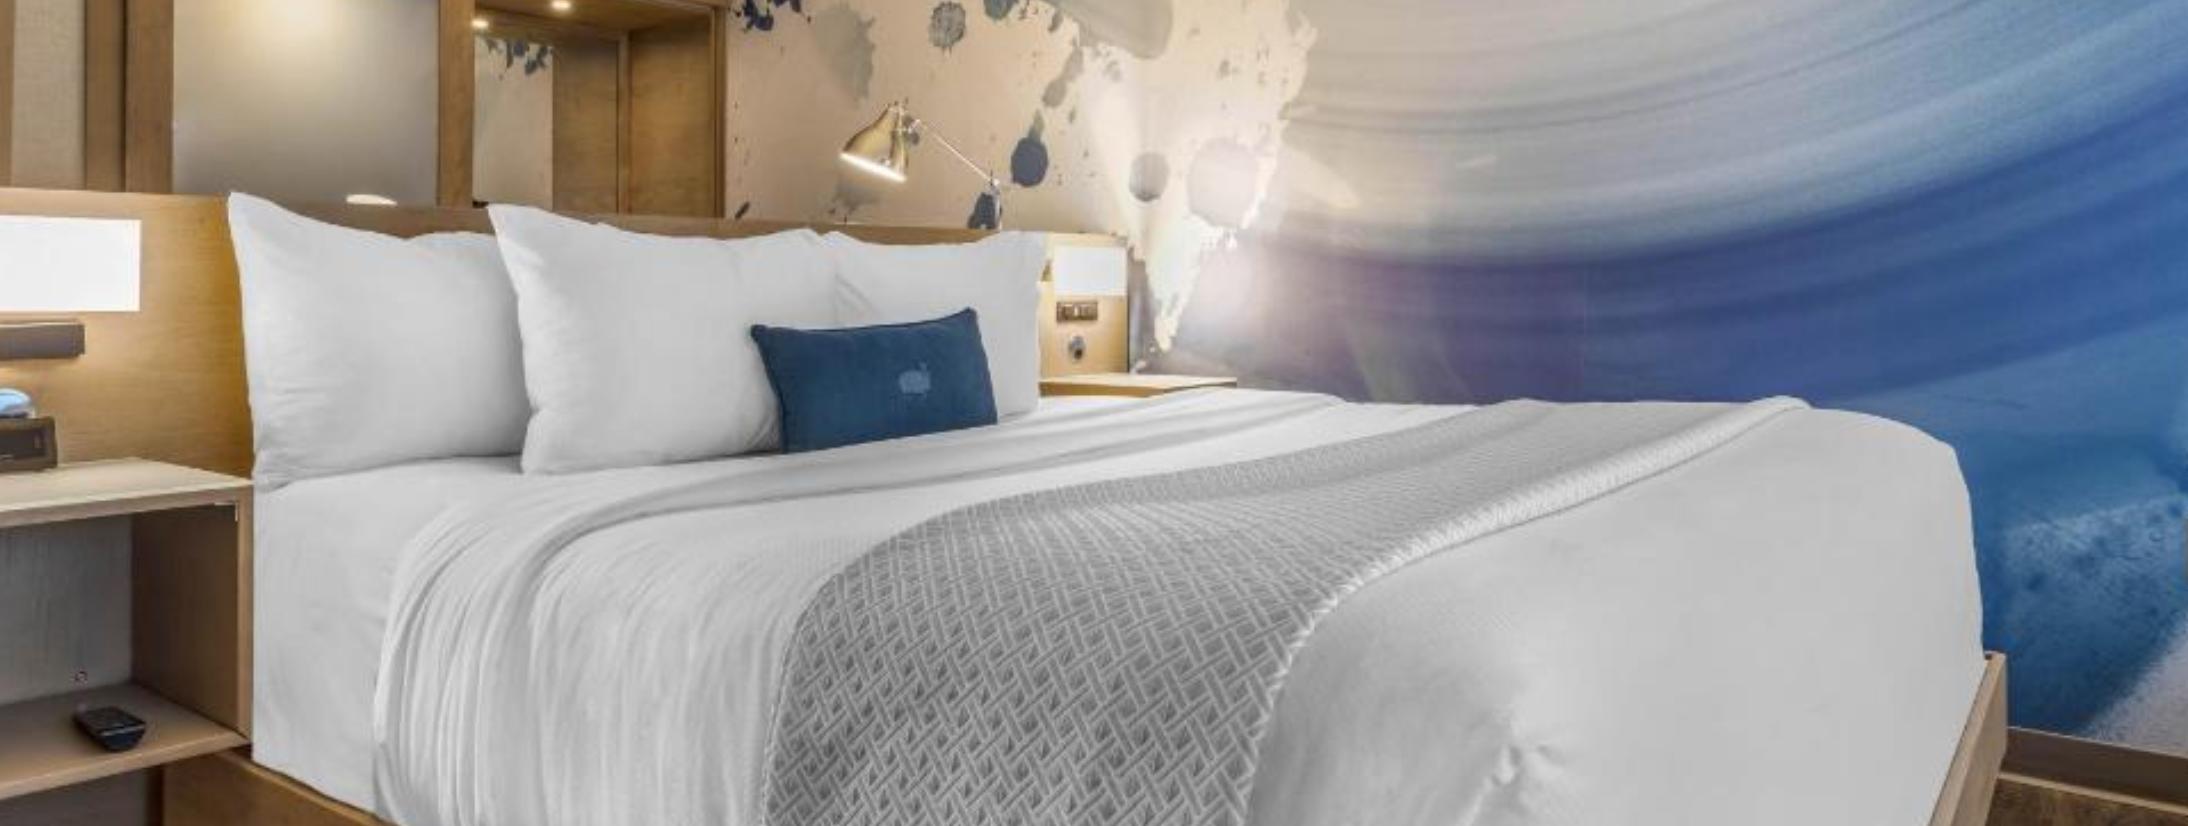 https://www.hotelsbyday.com/_data/default-hotel_image/3/18829/screenshot-2020-06-15-at-12-42-23-pm.png